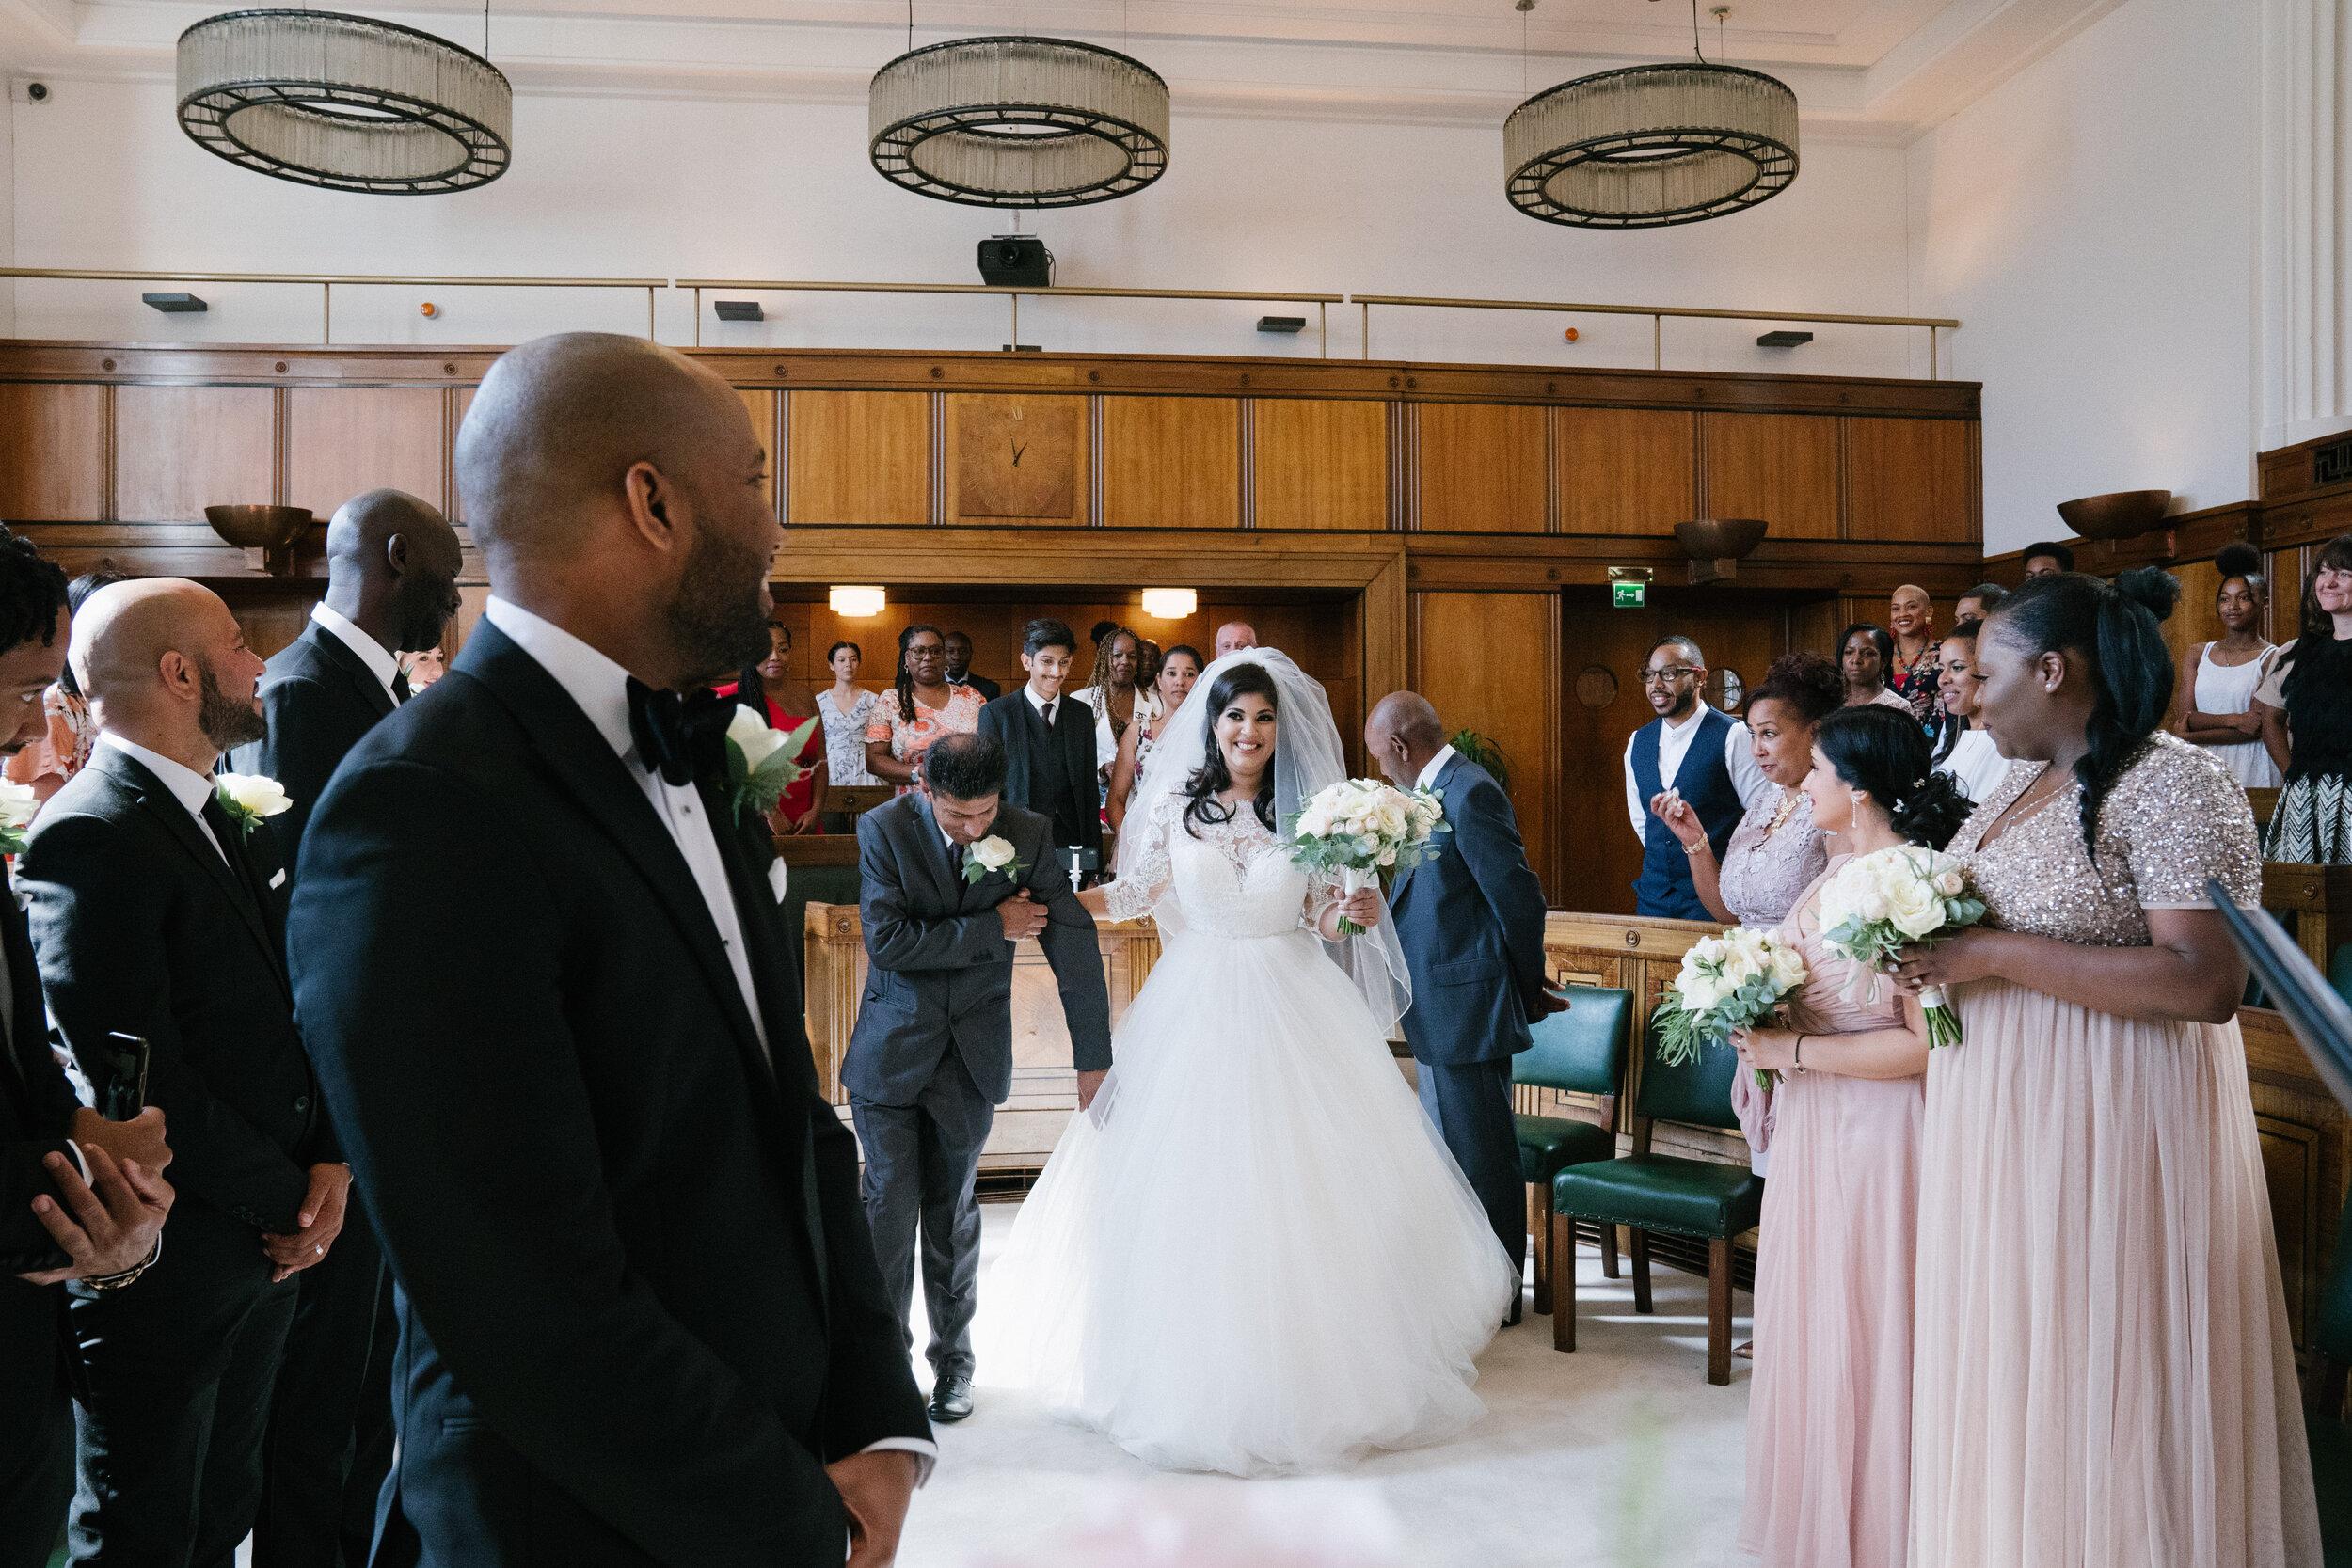 east-london-wedding-photographer-videographer-patriot-square-apartments-30